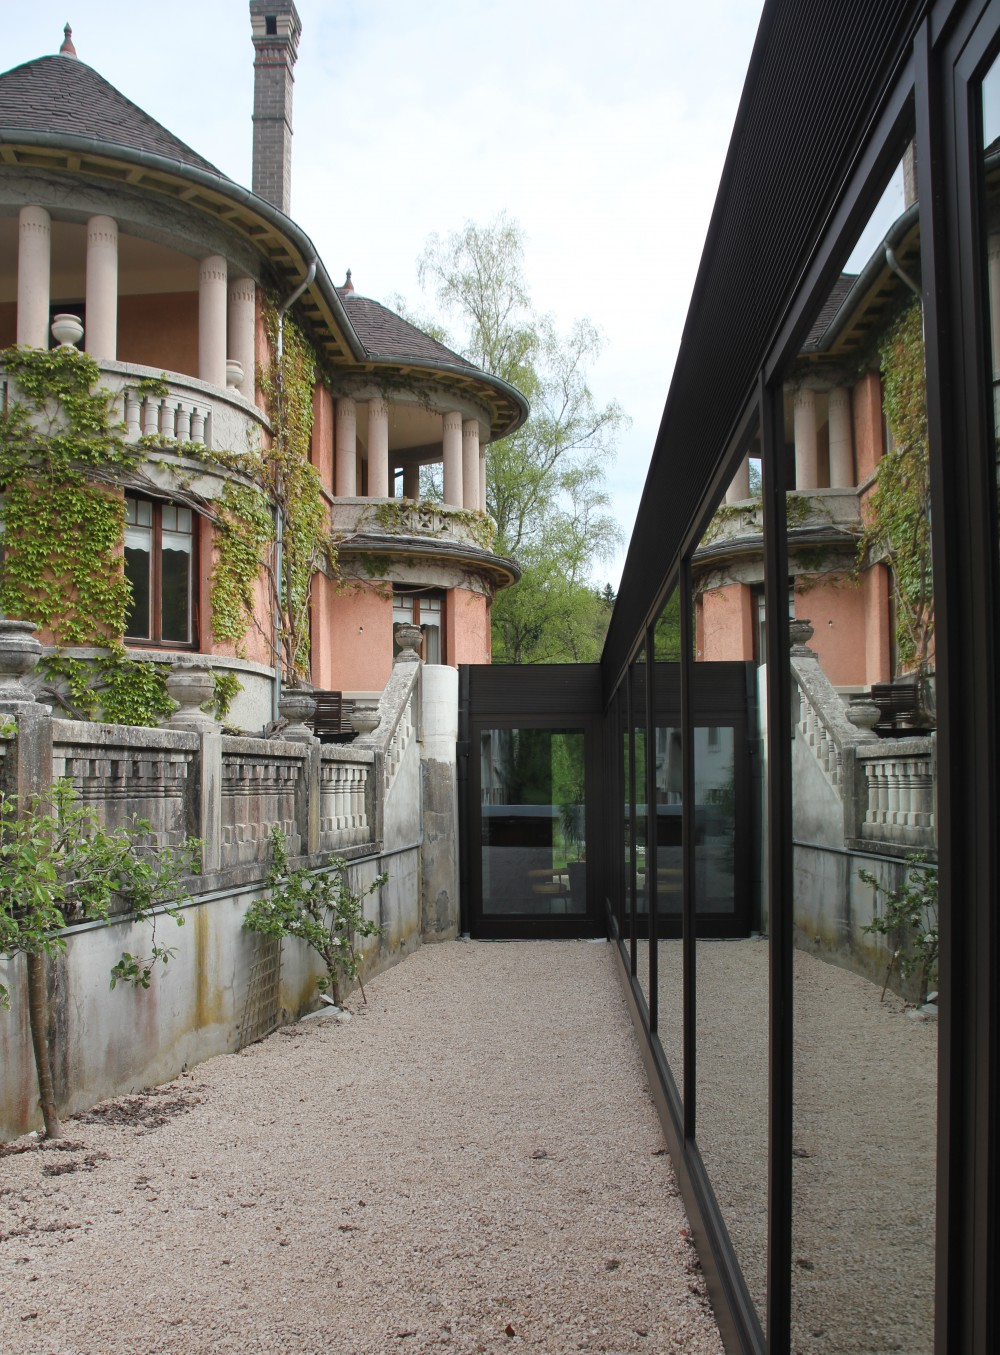 Pavillon-a-vaucluse-france-129-978-5